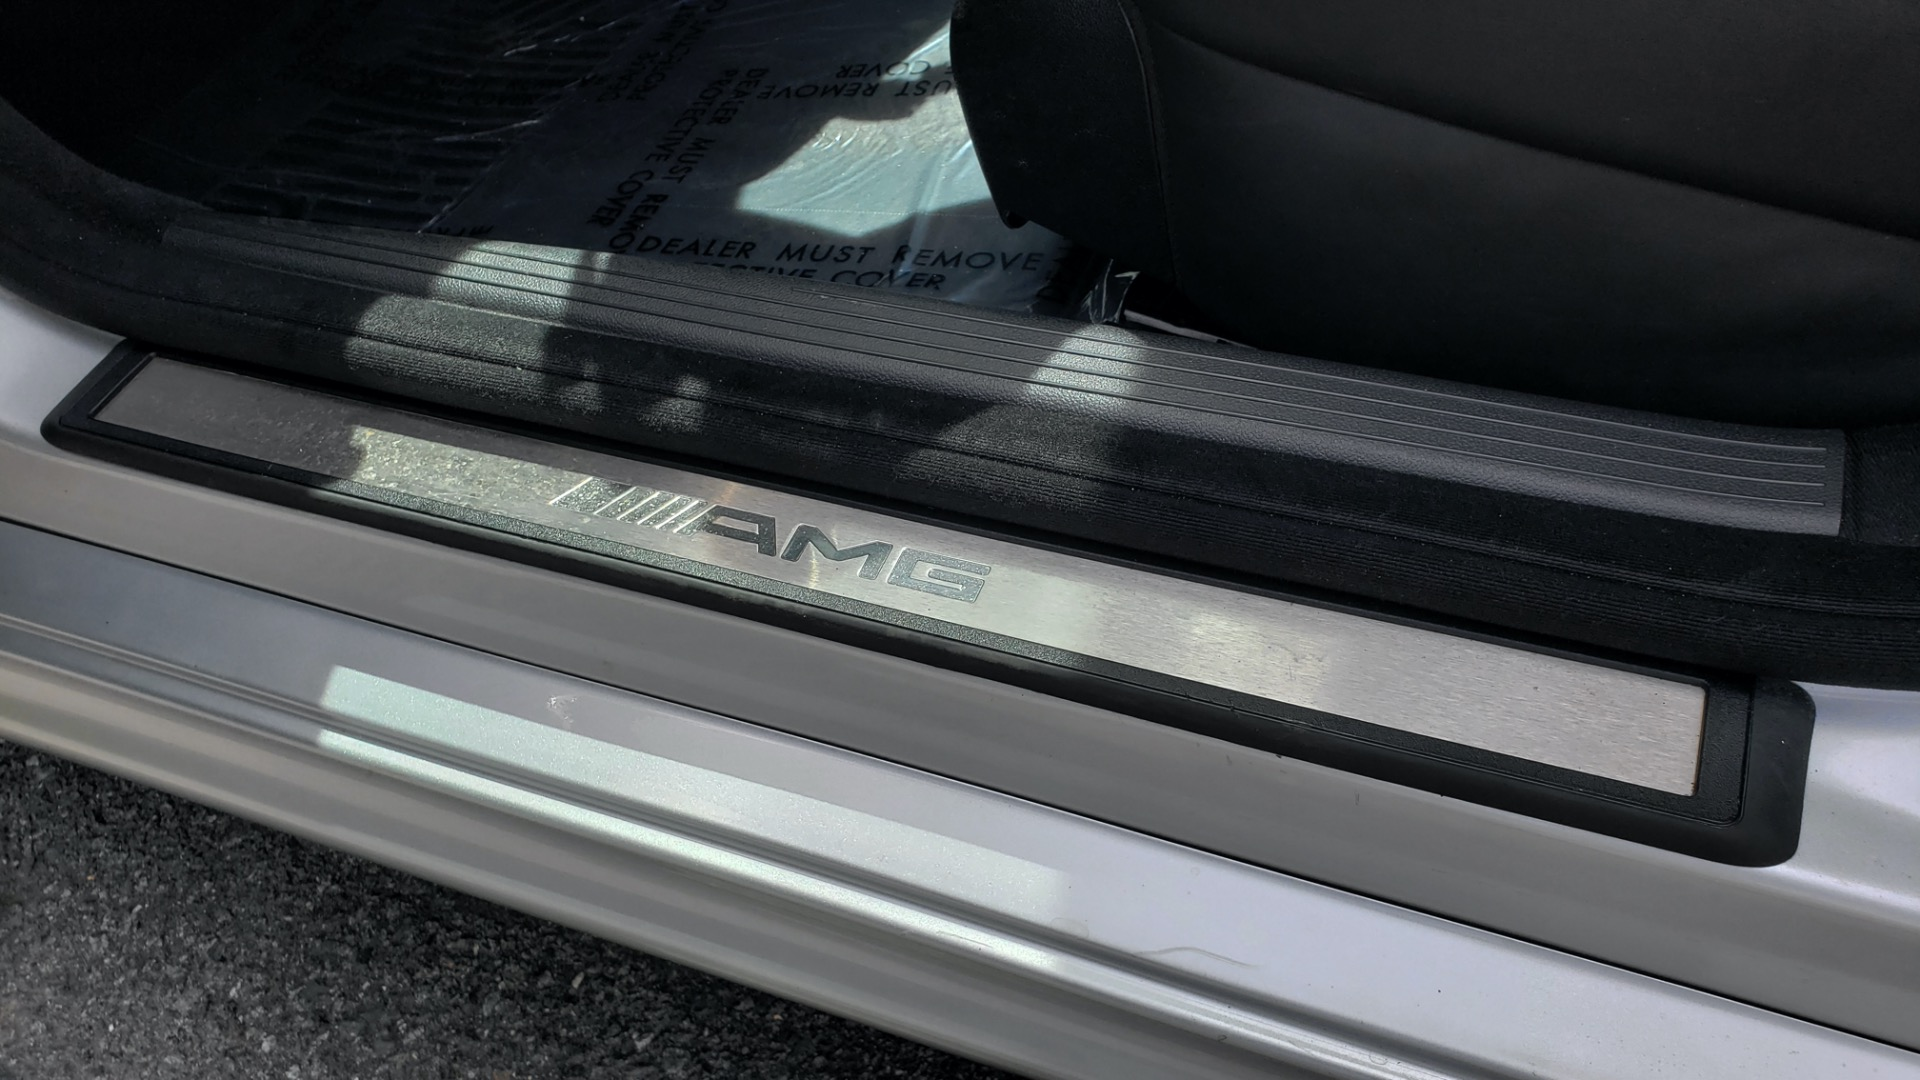 Used 2007 Mercedes-Benz E-Class E63 AMG WAGON / NAV / SUNROOF / HARMAN/KARDON for sale $29,000 at Formula Imports in Charlotte NC 28227 43